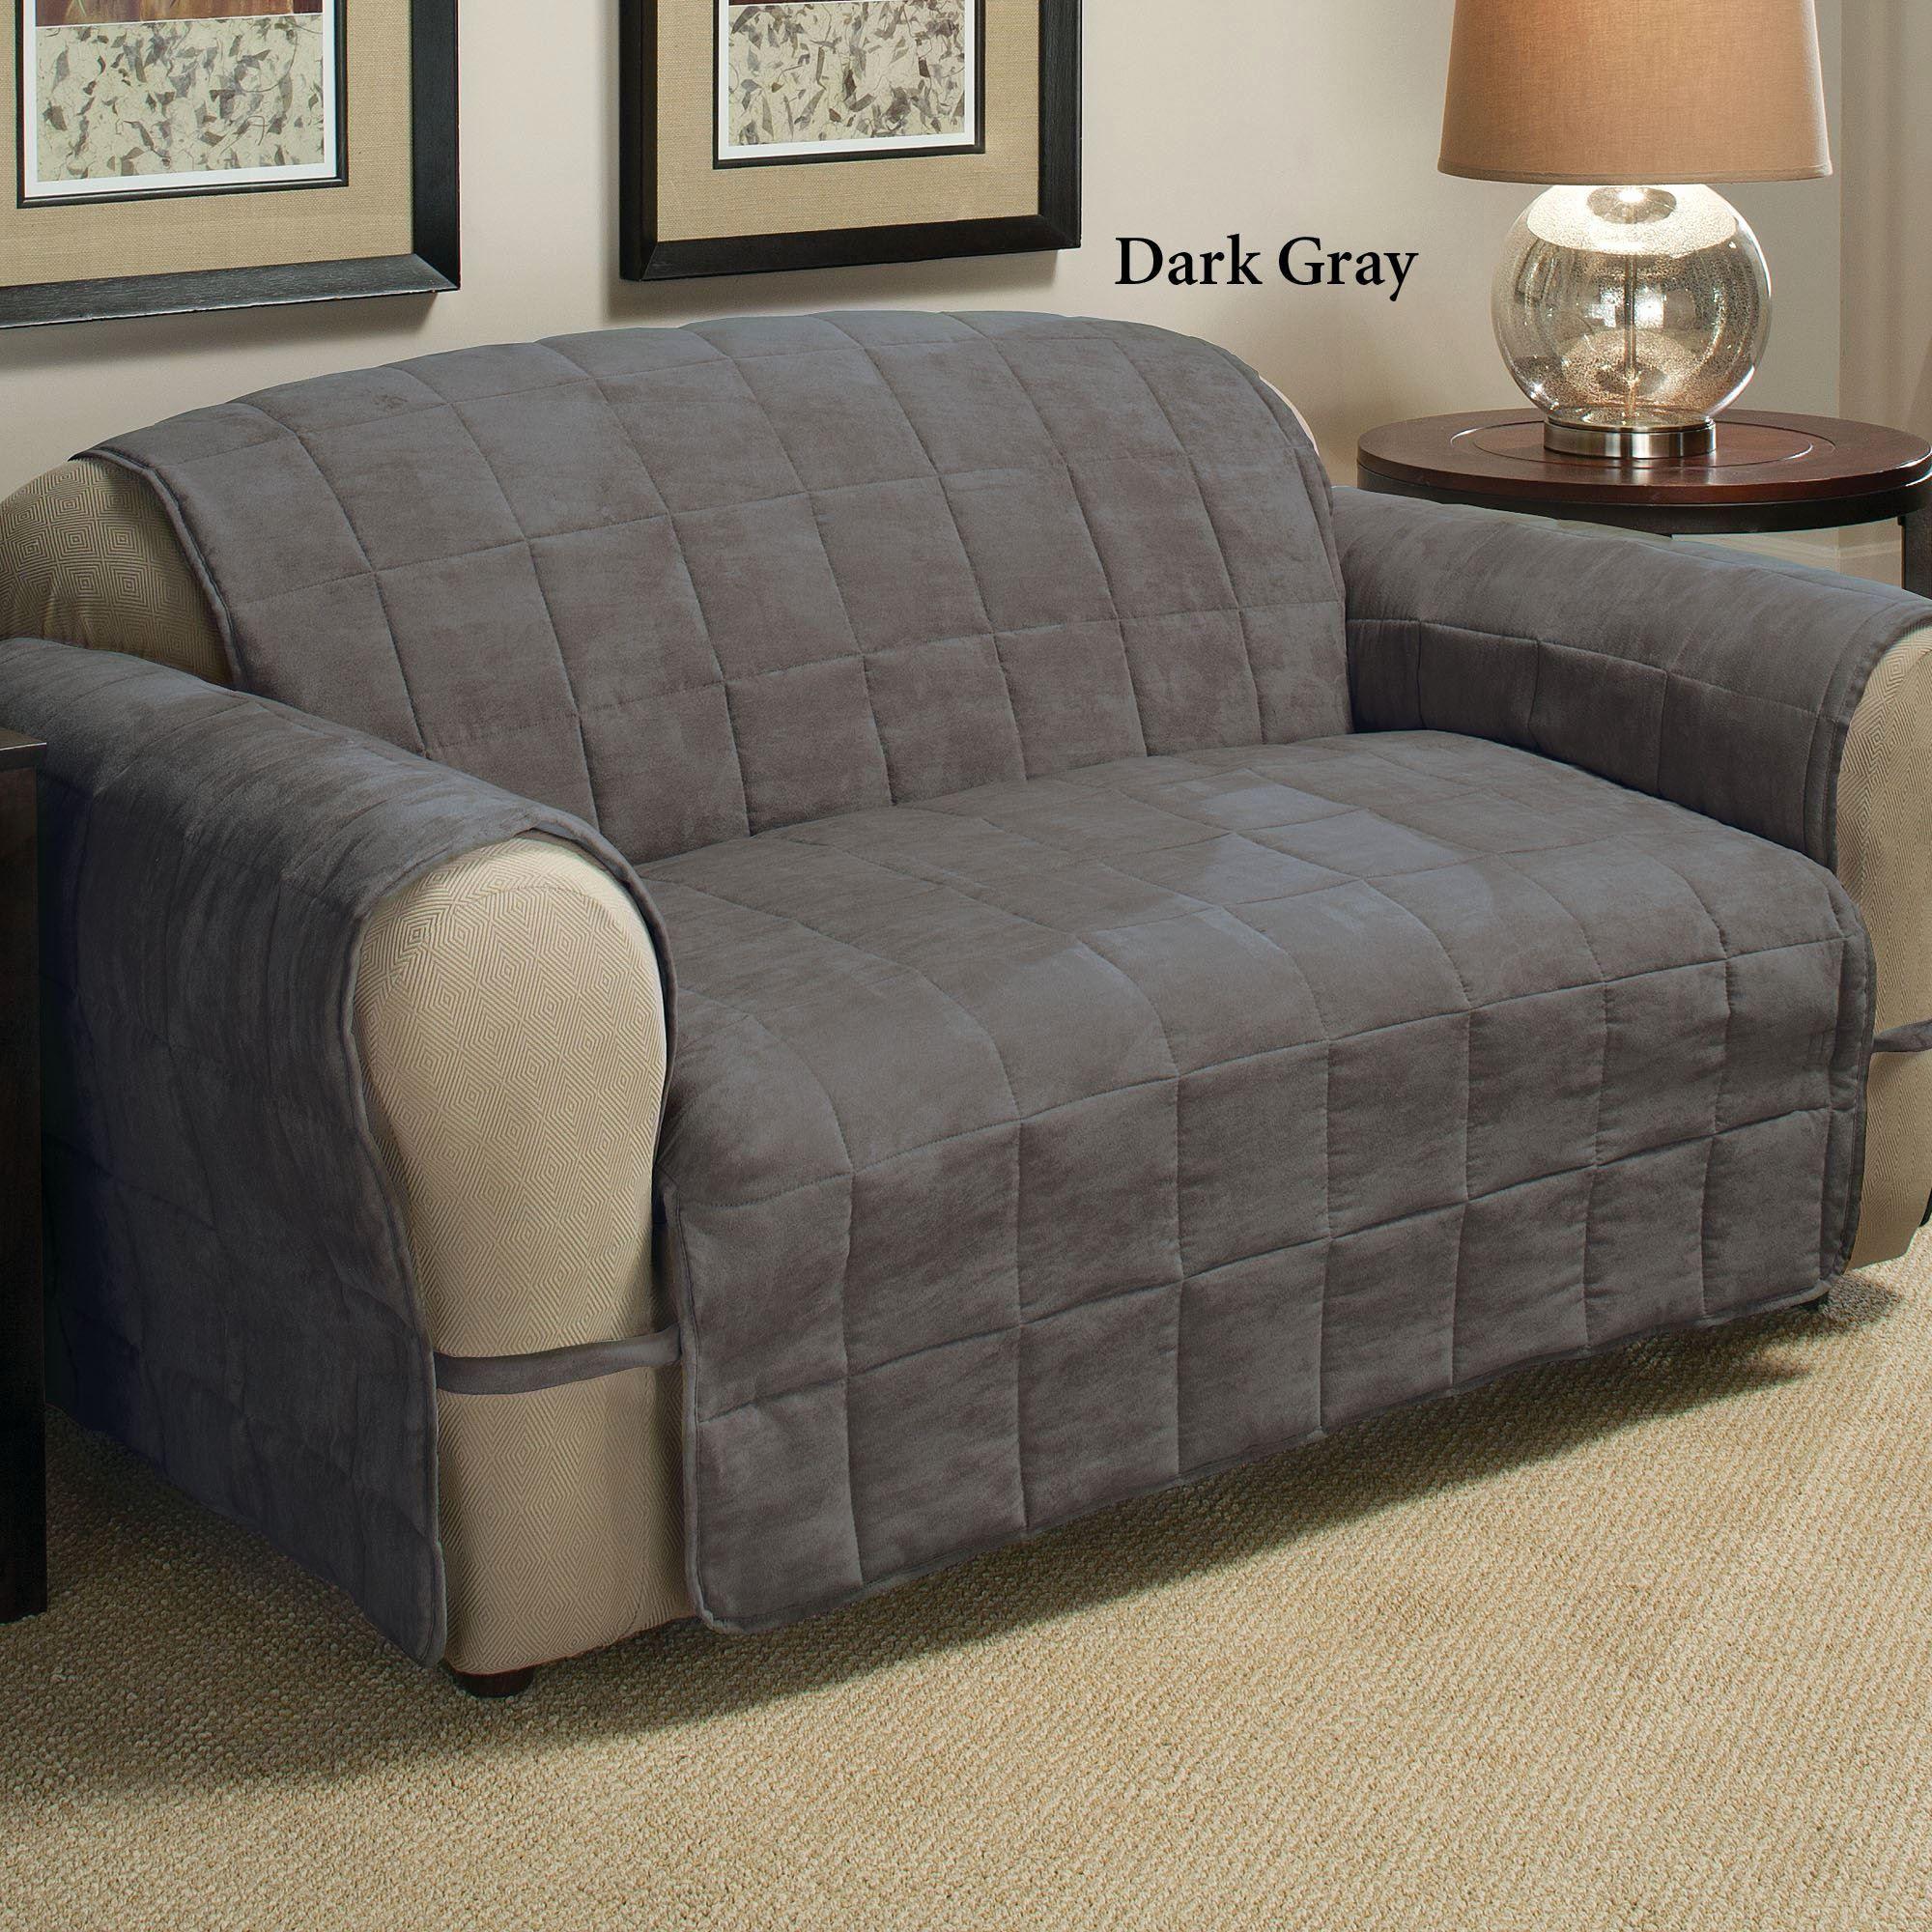 Gray Velvet Slipcover Sofa Bed Canada Sears Slipcovers Great Bay Home Plush Form